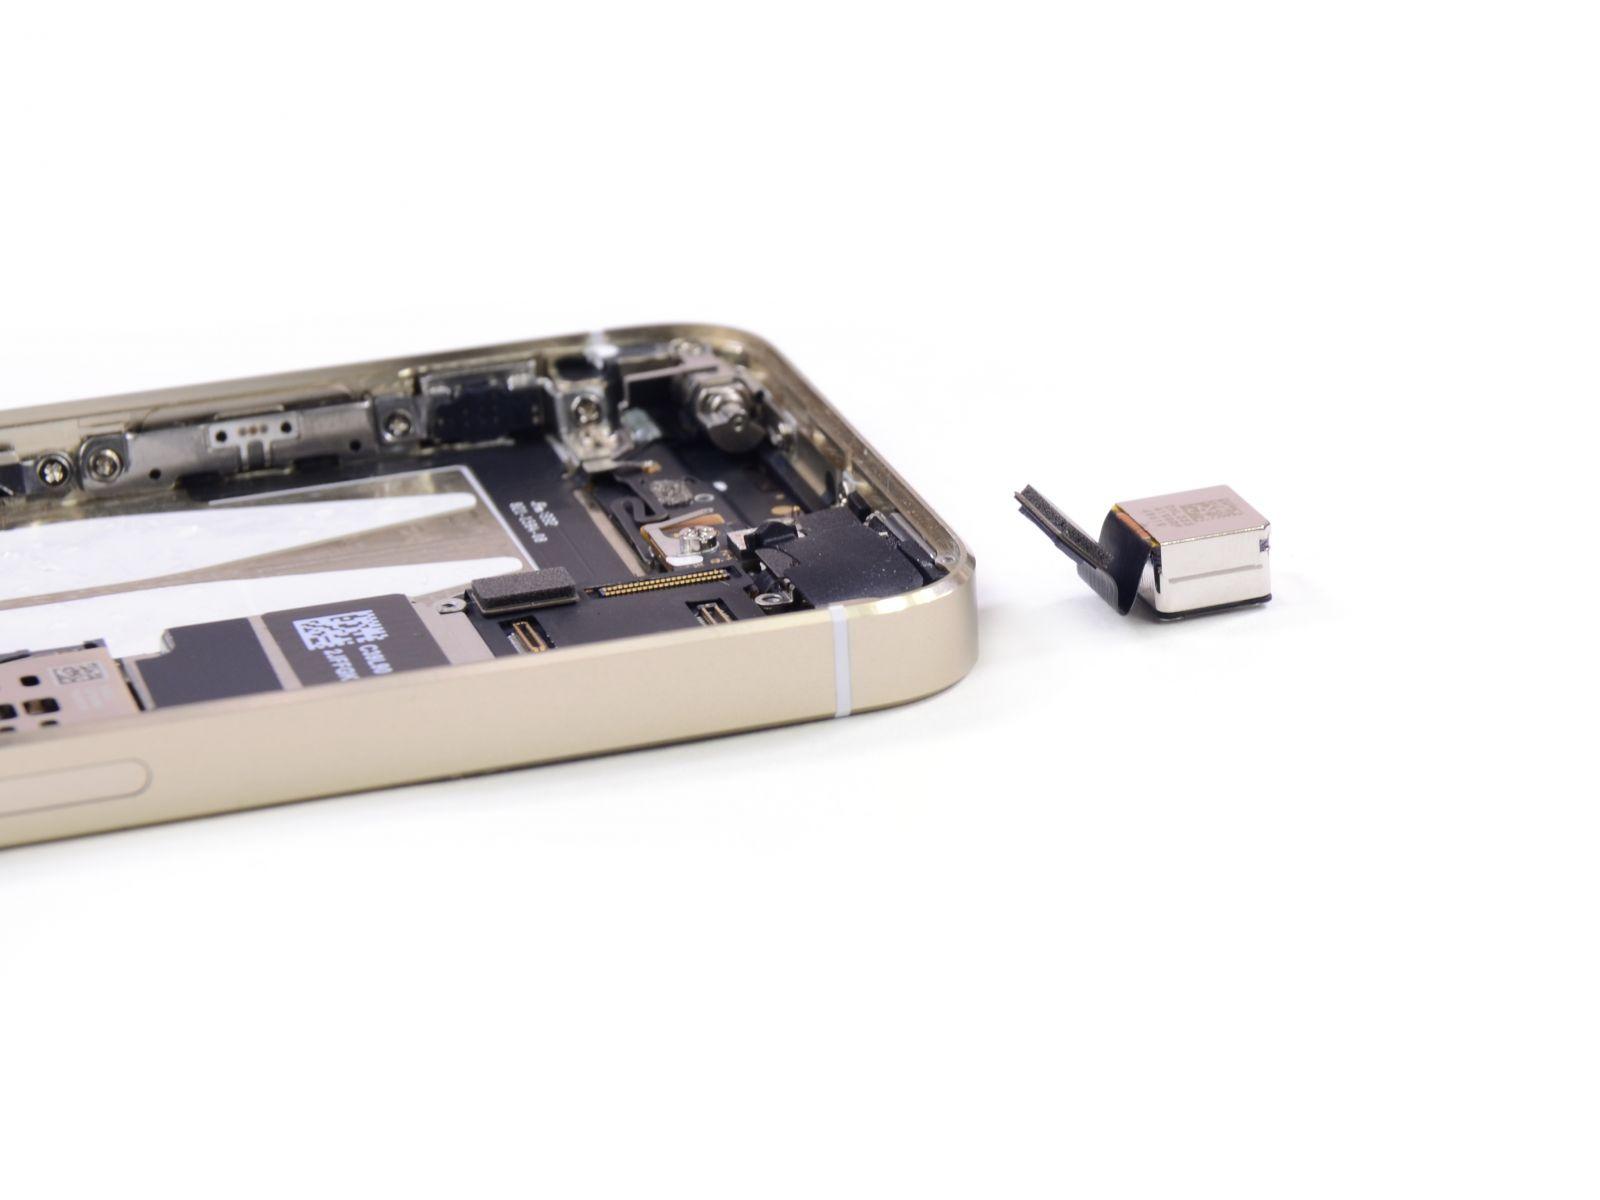 kak-razobrat-iphone-5s-27